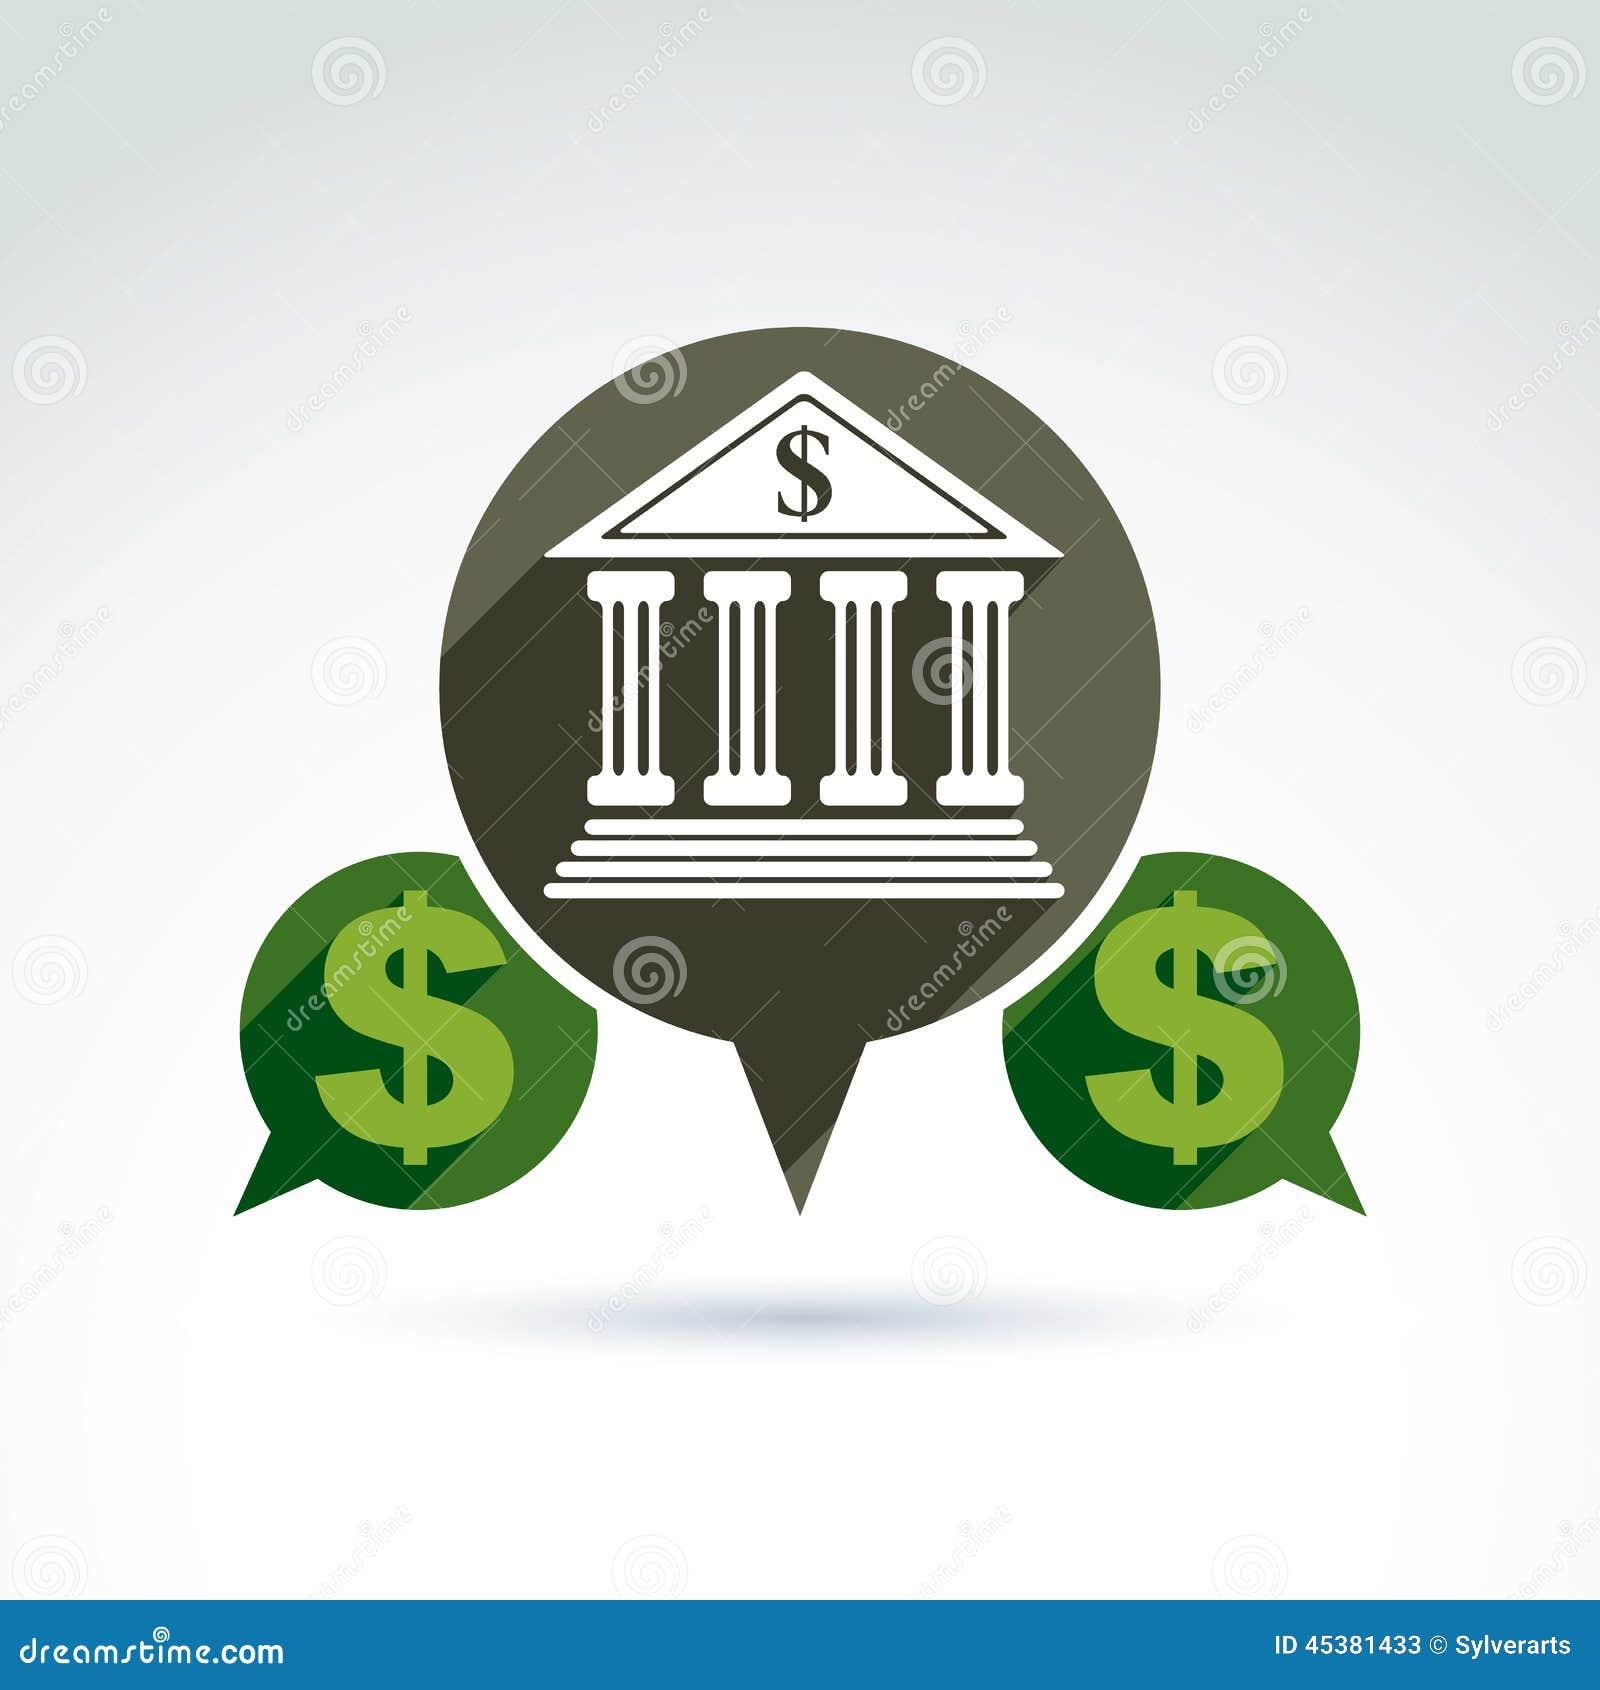 bank as a financial institution 爱词霸权威在线词典,为您提供institution的中文意思,institution的用法讲解,institution的读音,institution的同义词,institution的反义词,institution的例句等英语服务.